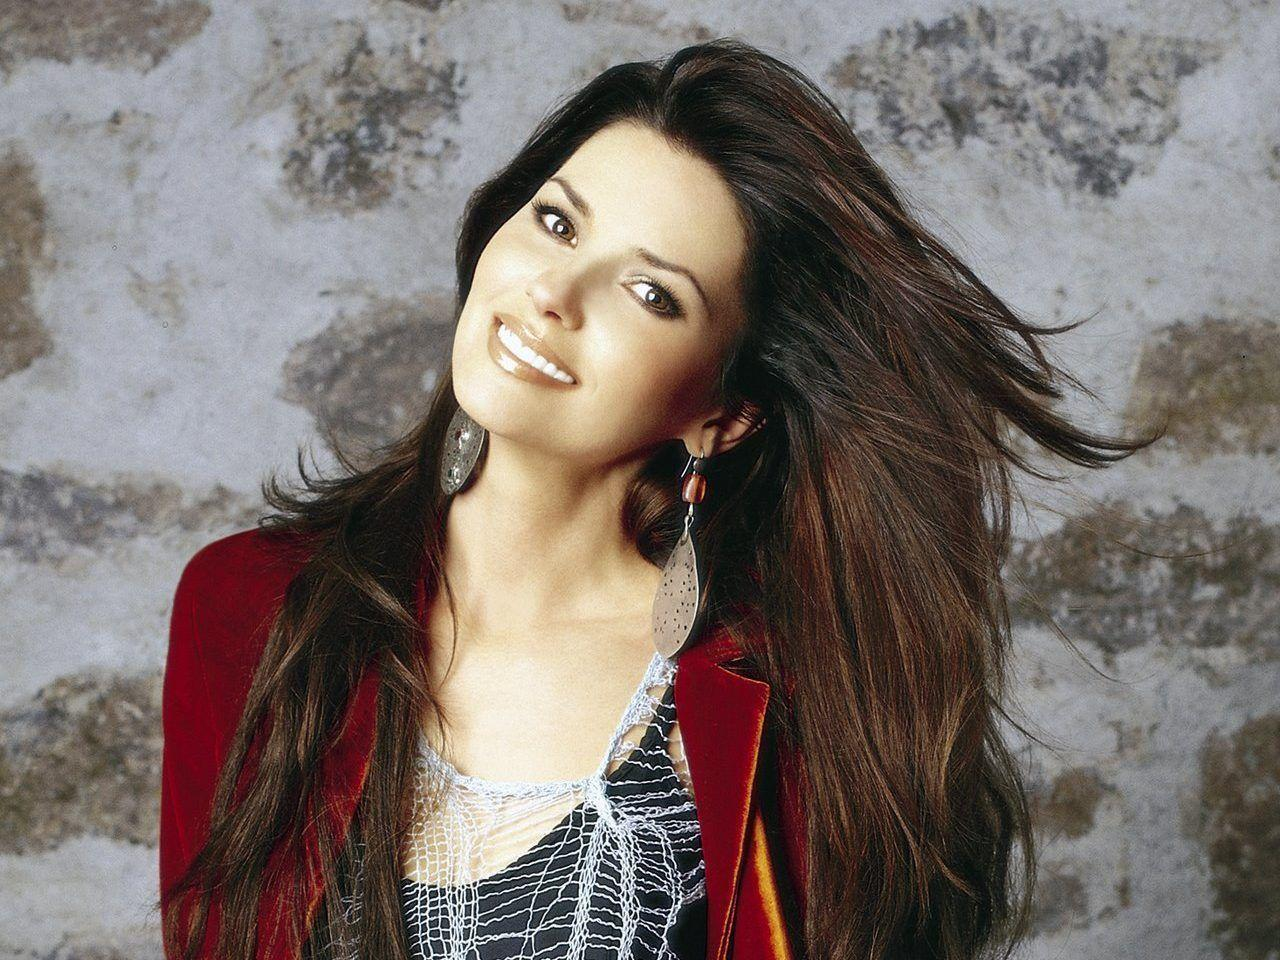 Country Music Stars Wallpaper: Shania Twain Wallpapers